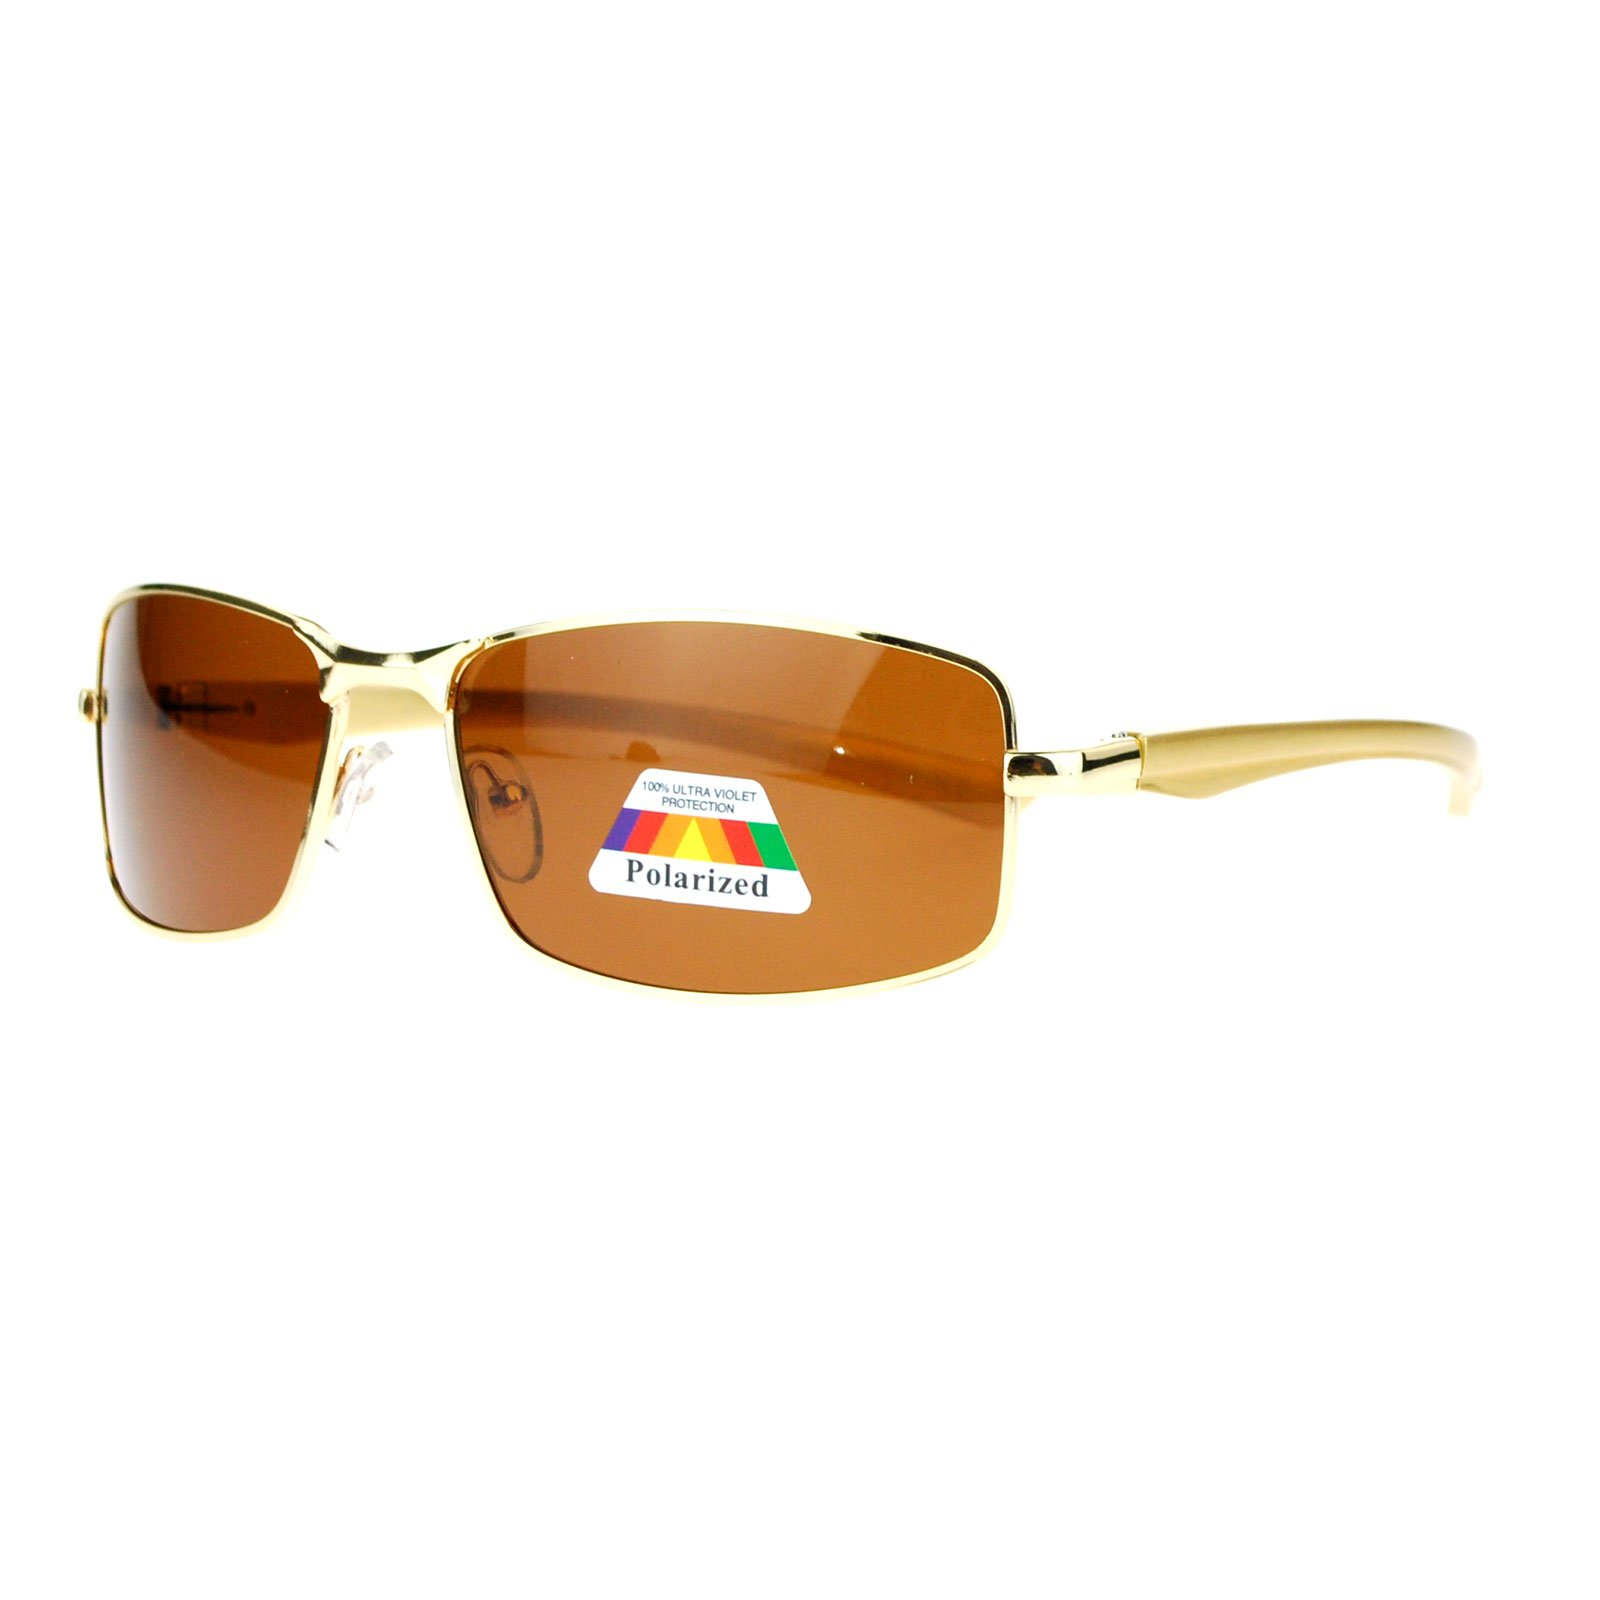 SA106 Mens Polarized Spring Hinge Luxury Designer Fashion Narrow Rectangular Sunglasses Gold by SA106